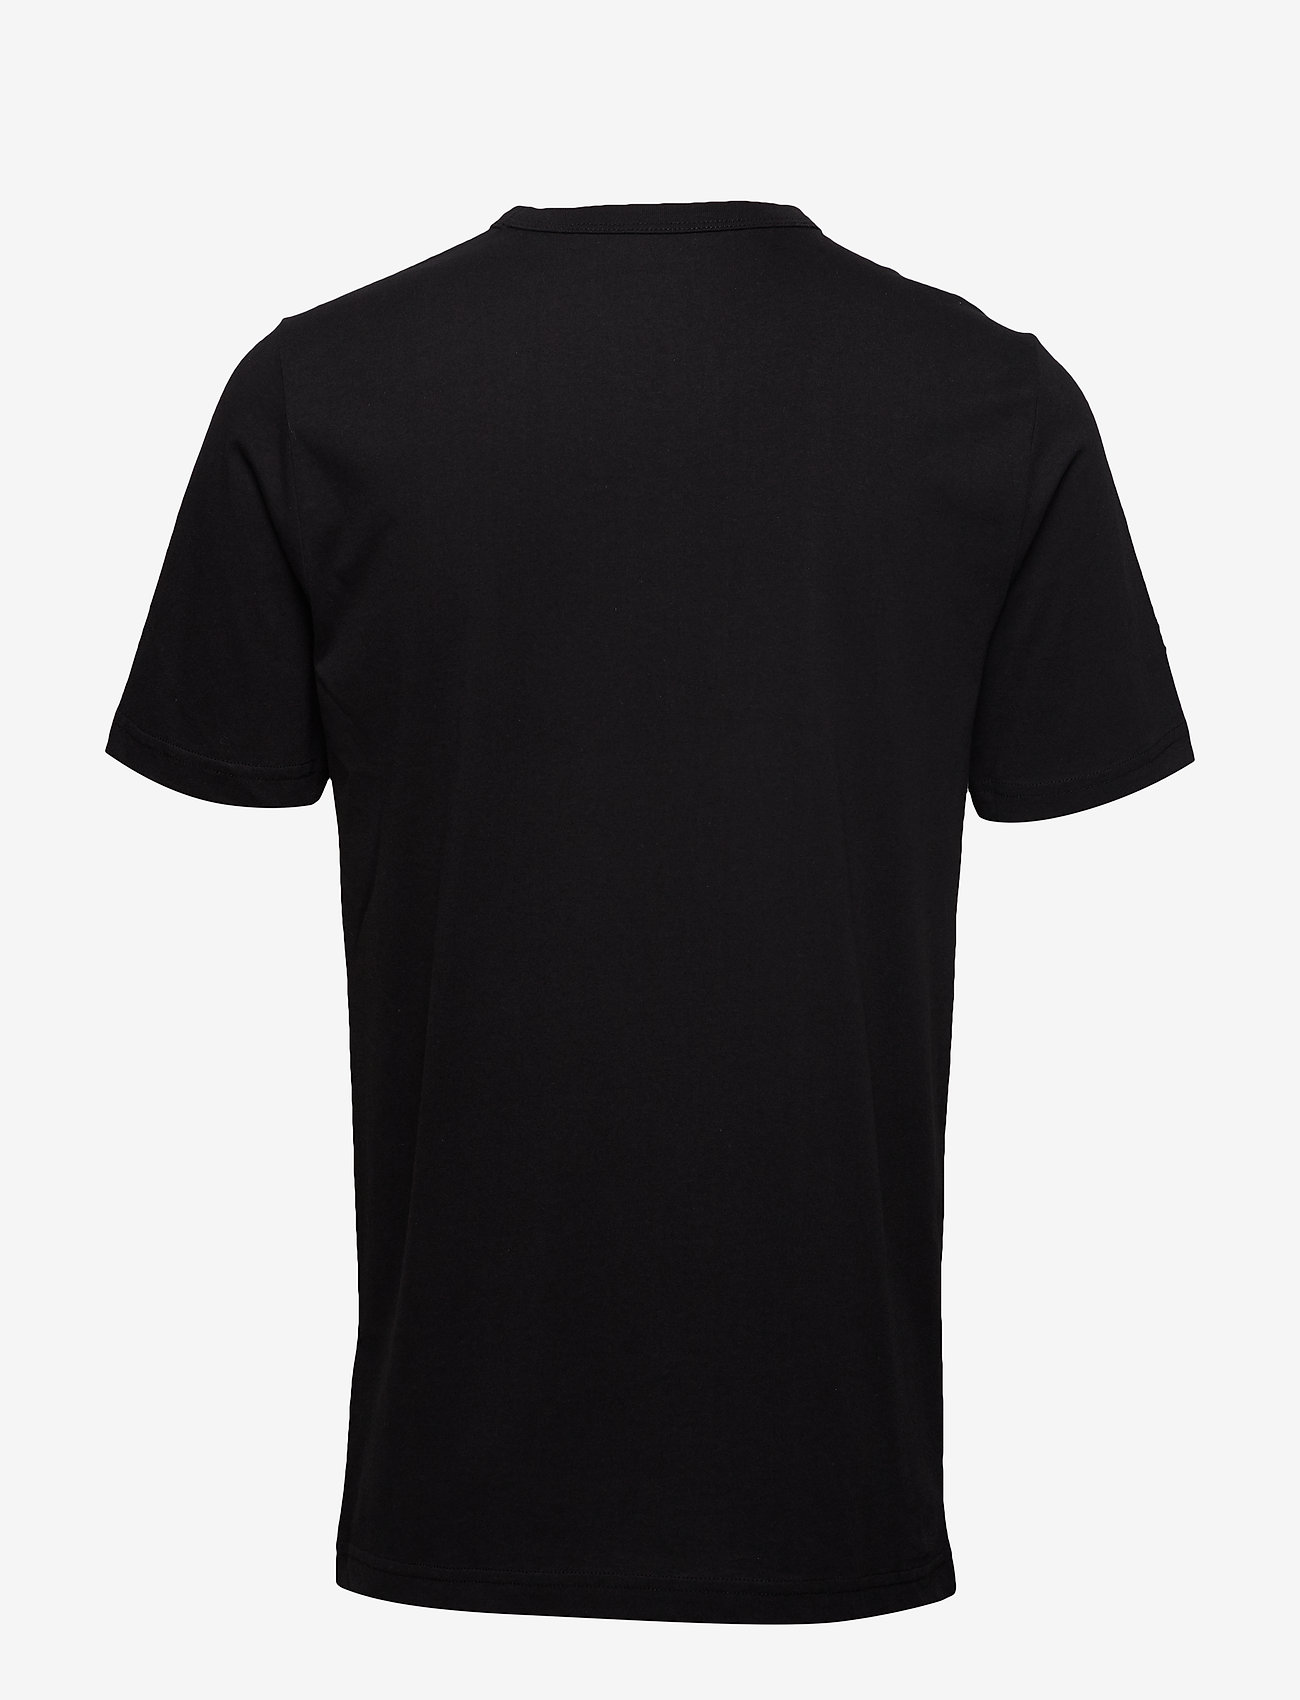 Lee Jeans Logo Tee (Black) - Lee Jeans A1i8JN